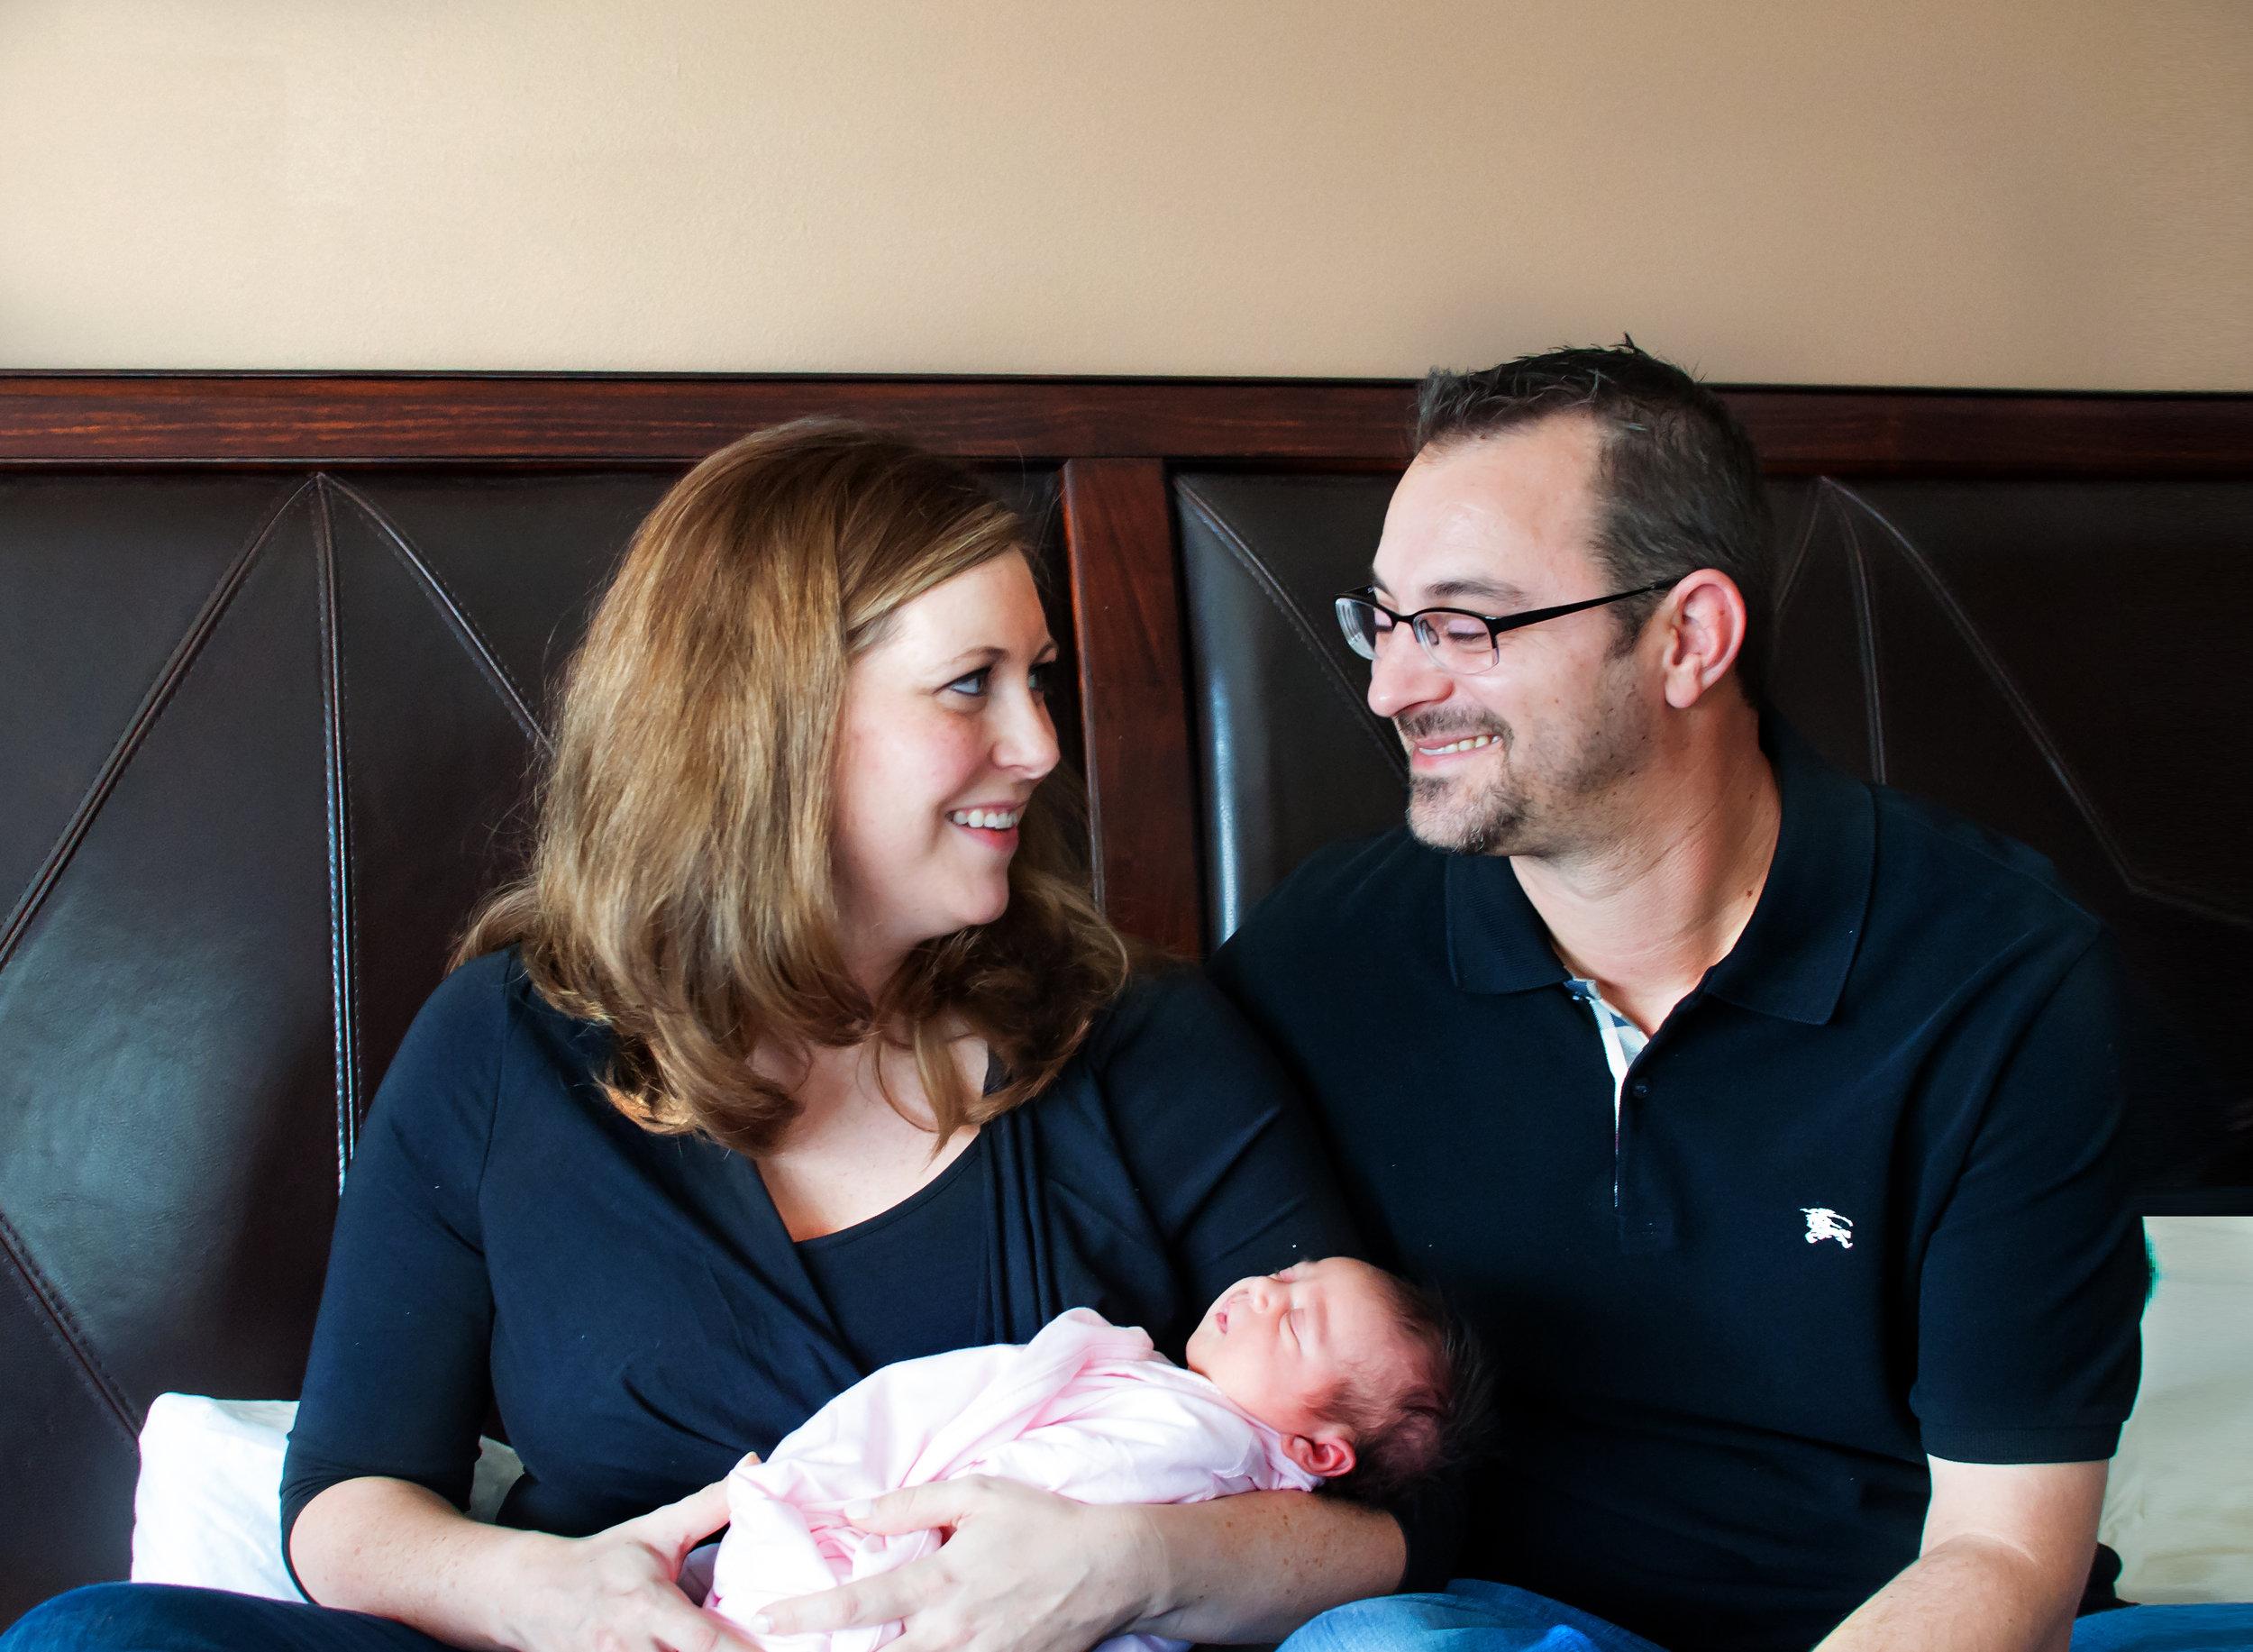 05-LCP-Newborn Sarah.jpg